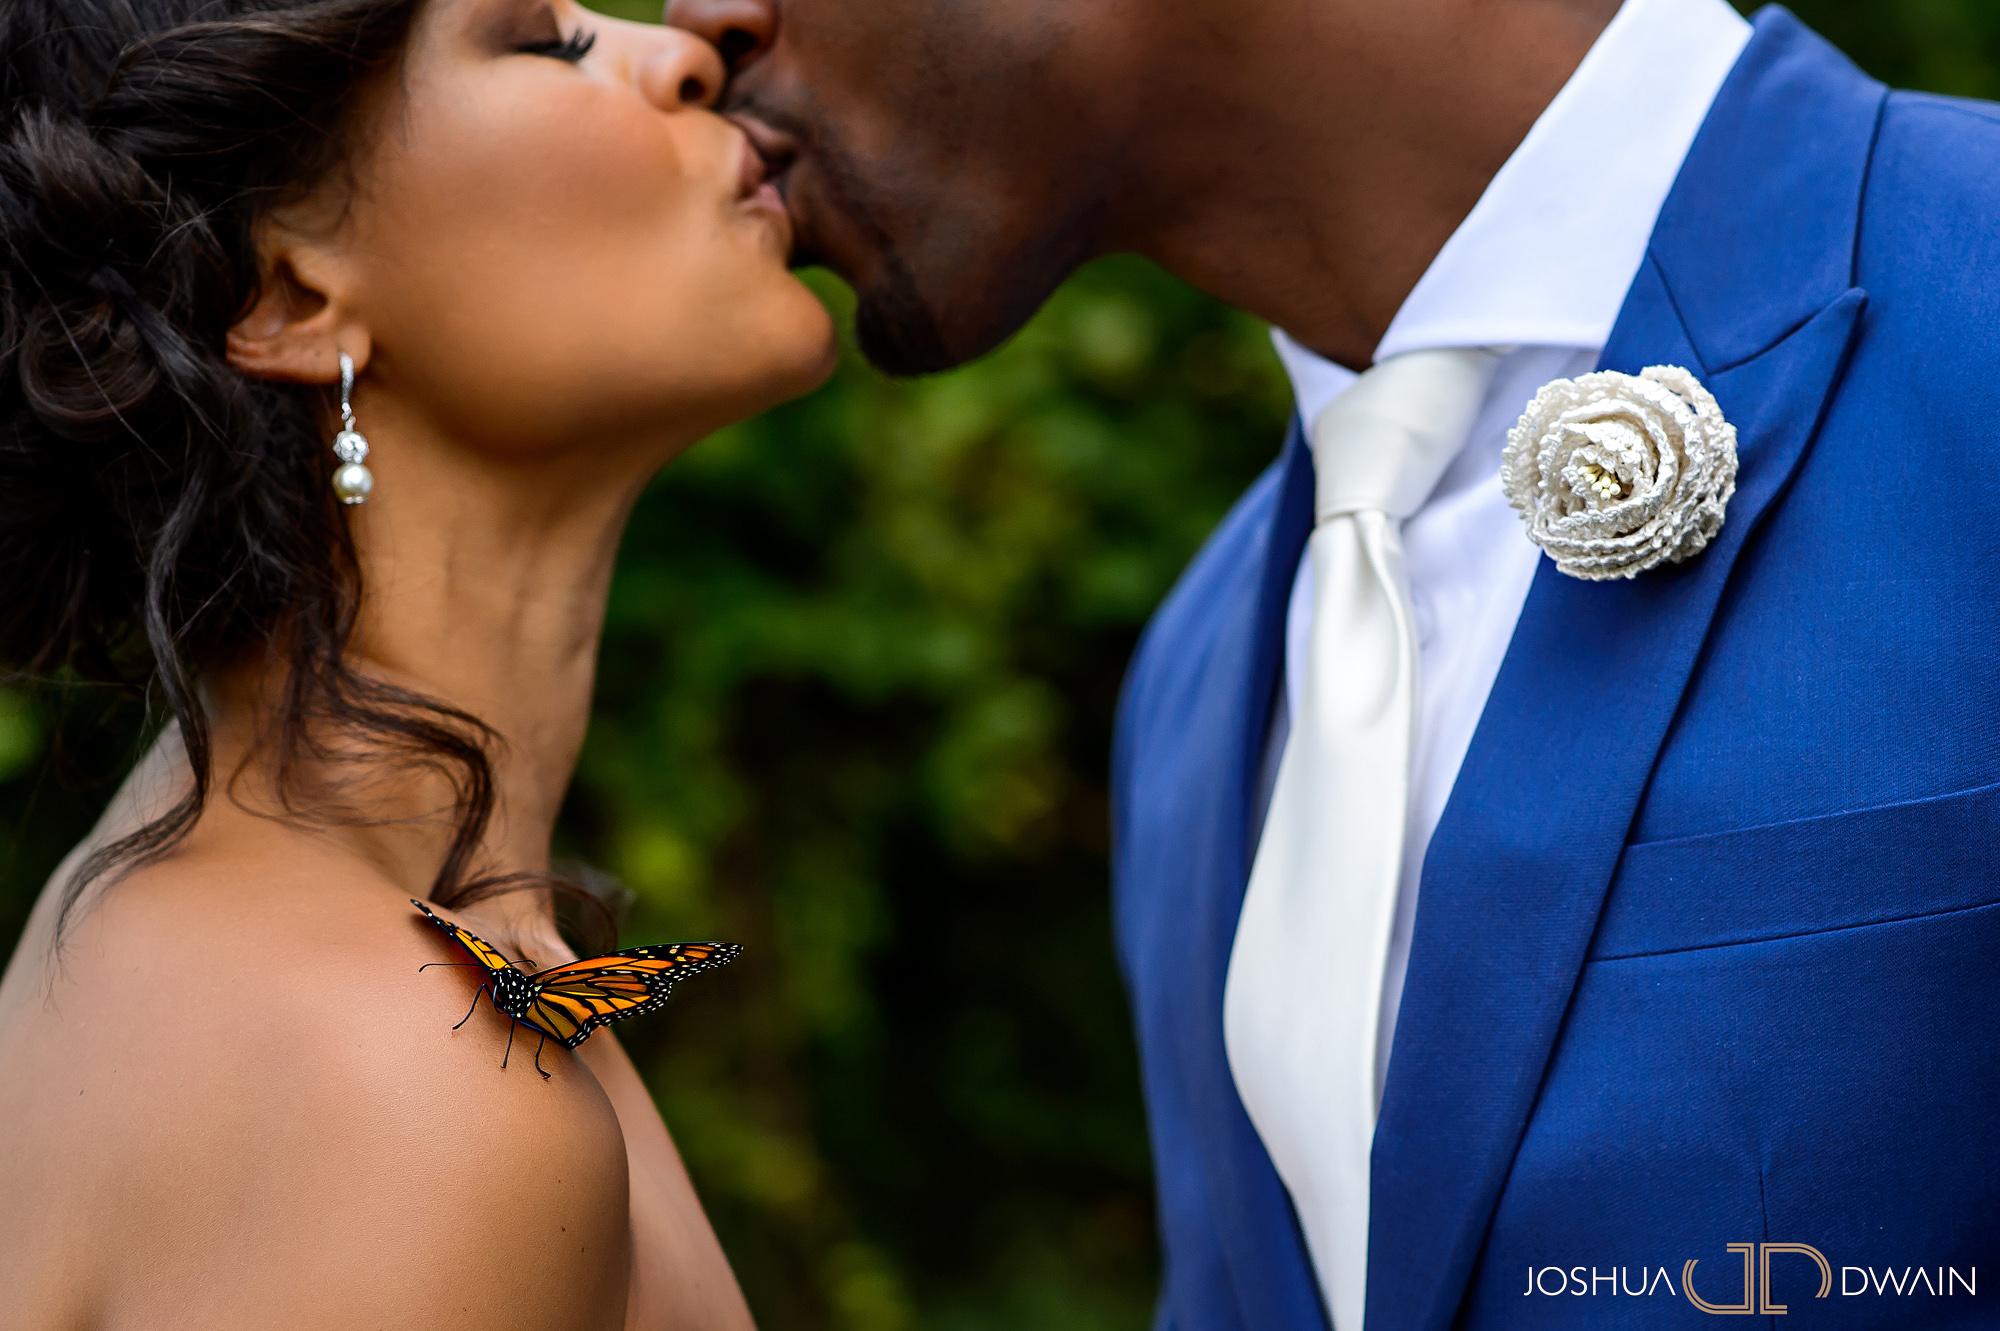 joshua-dwain-weddings-gallery-best-wedding-photographers-us-003